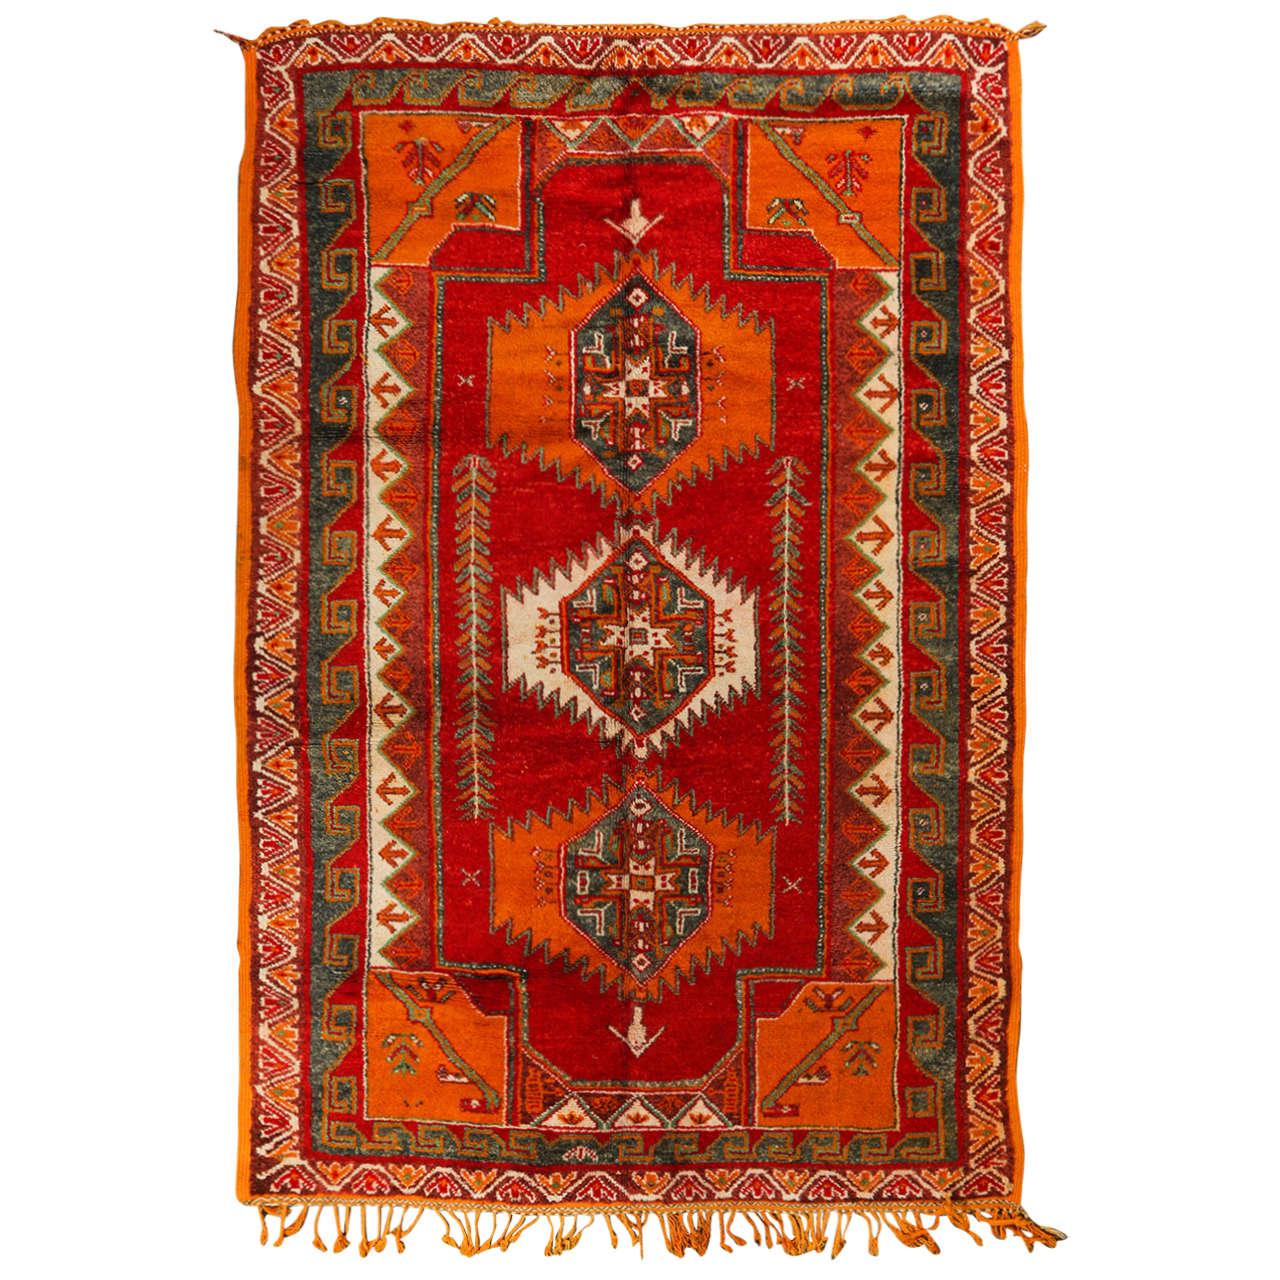 Moroccan Vintage Tribal Rug